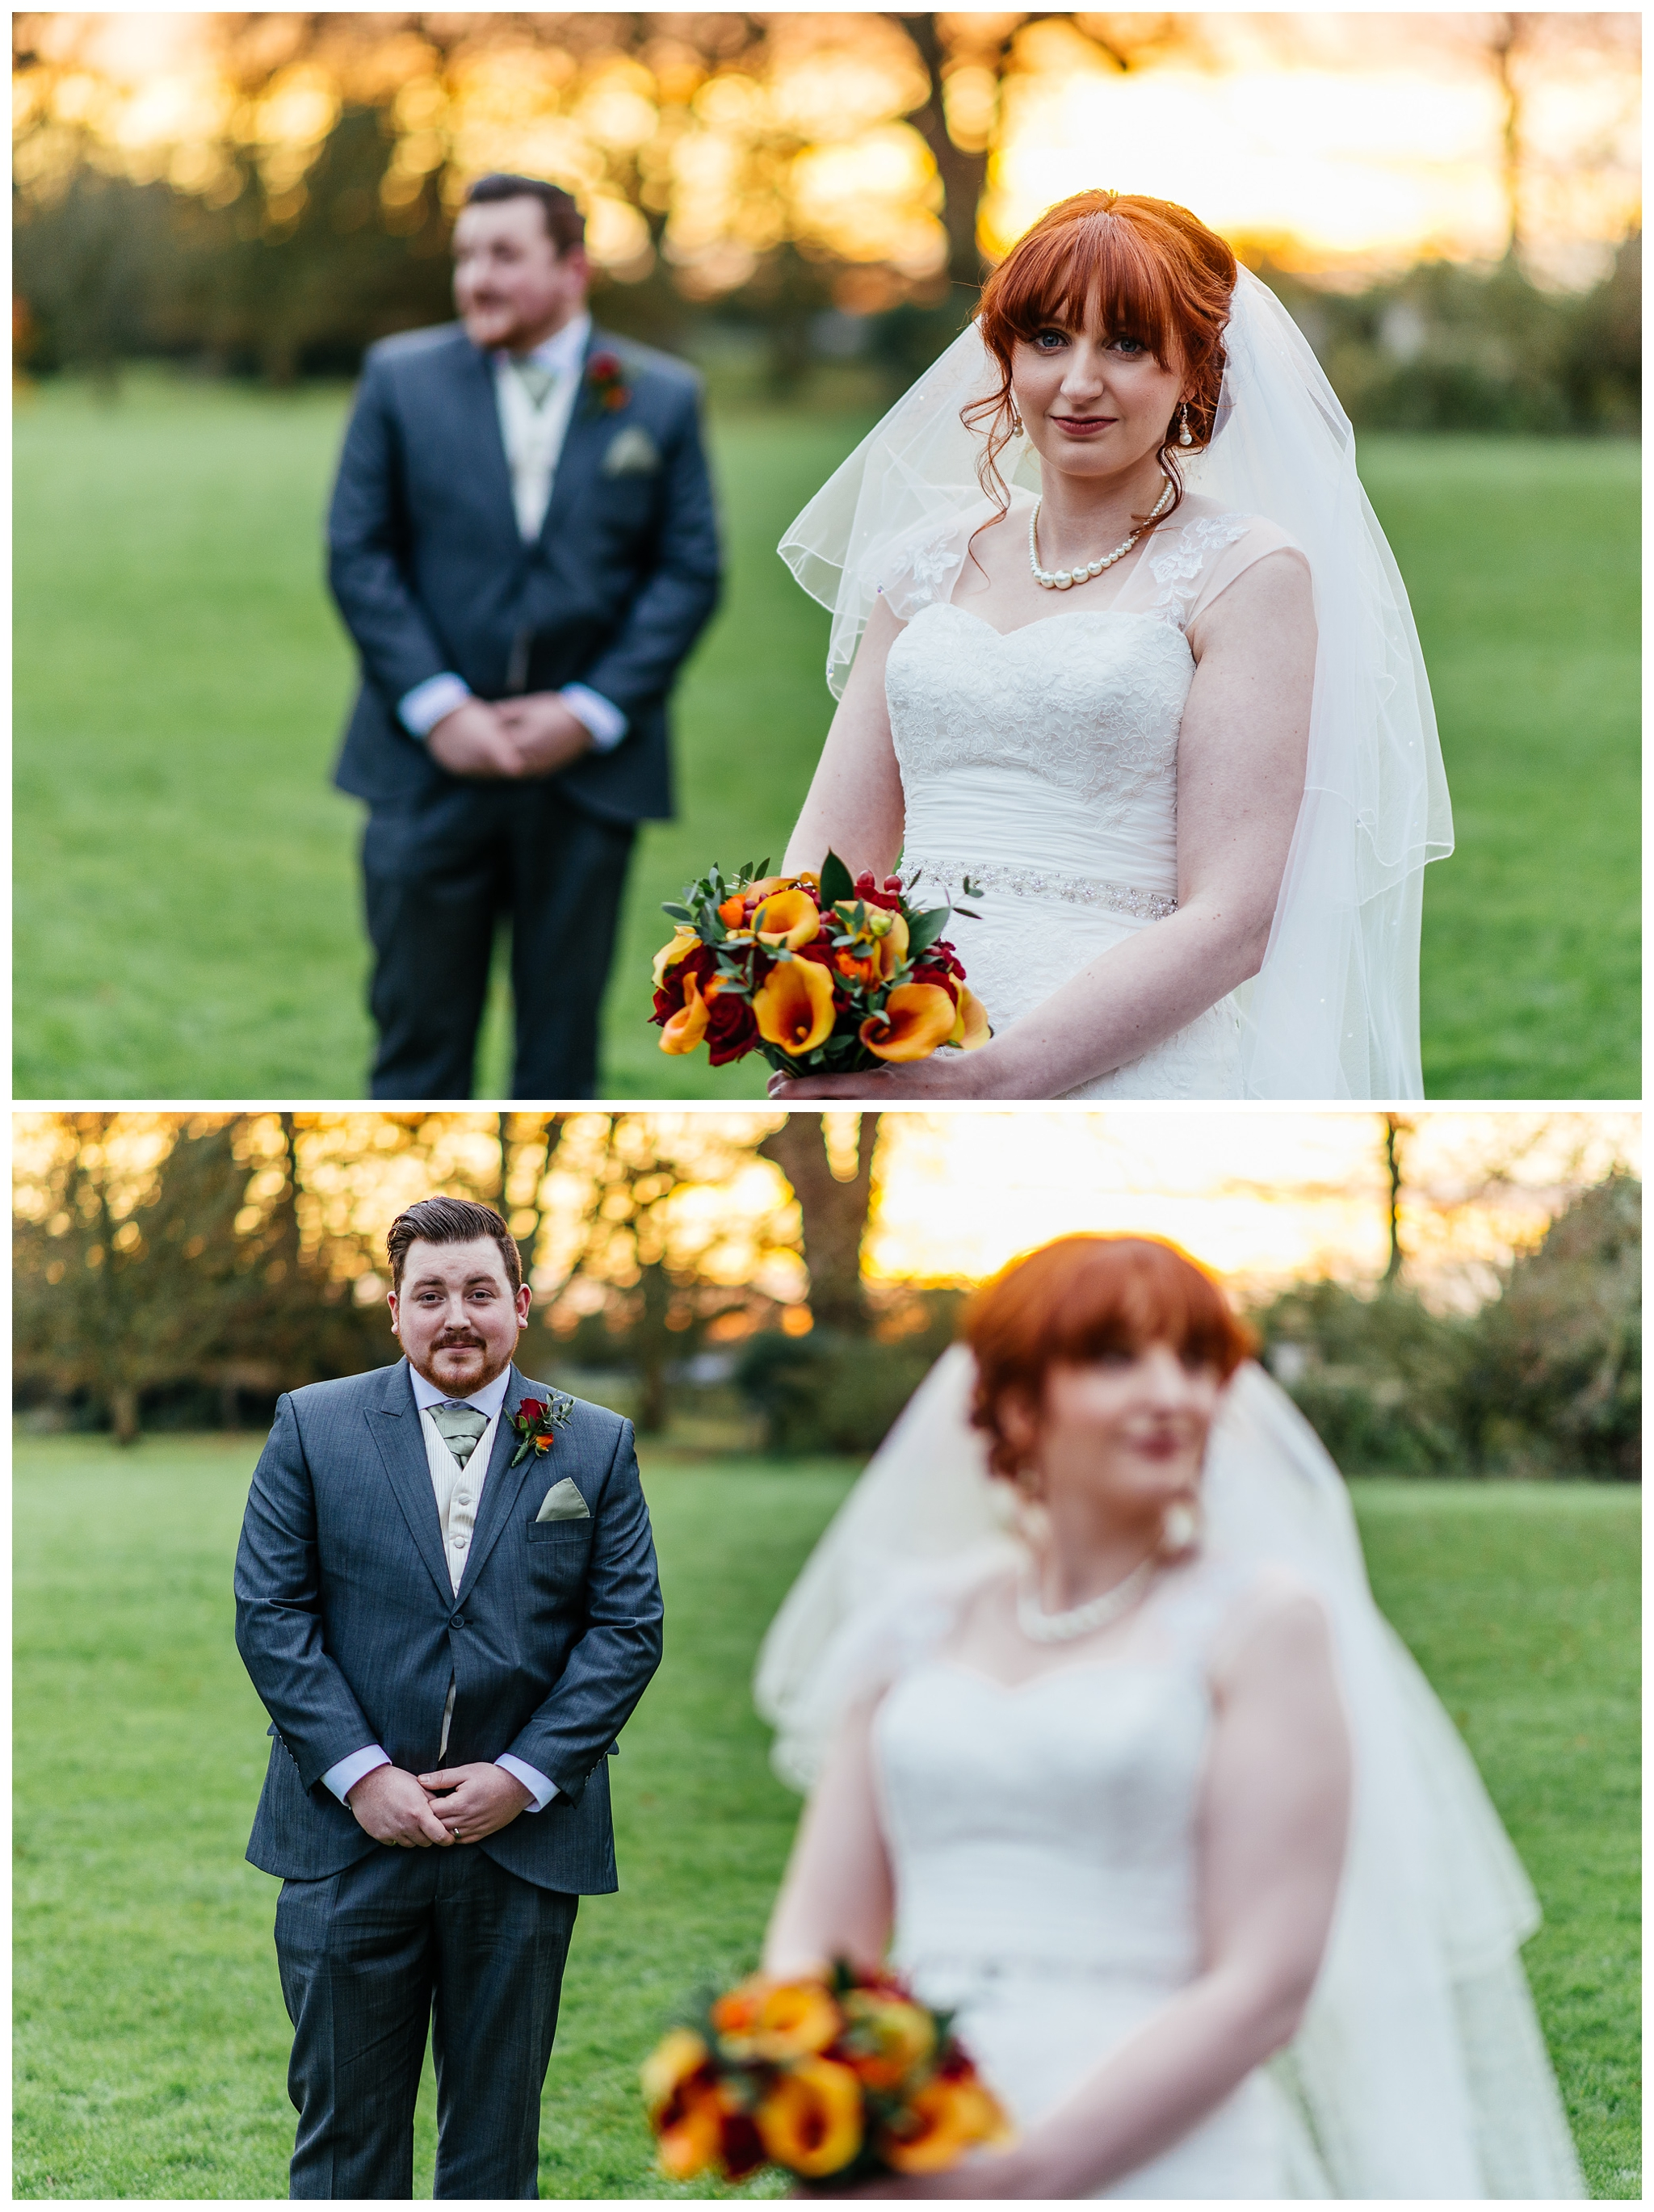 Emma&Paul-Elmore-Court-Winter-Wedding-Nikki-Cooper-Photography_0062.jpg